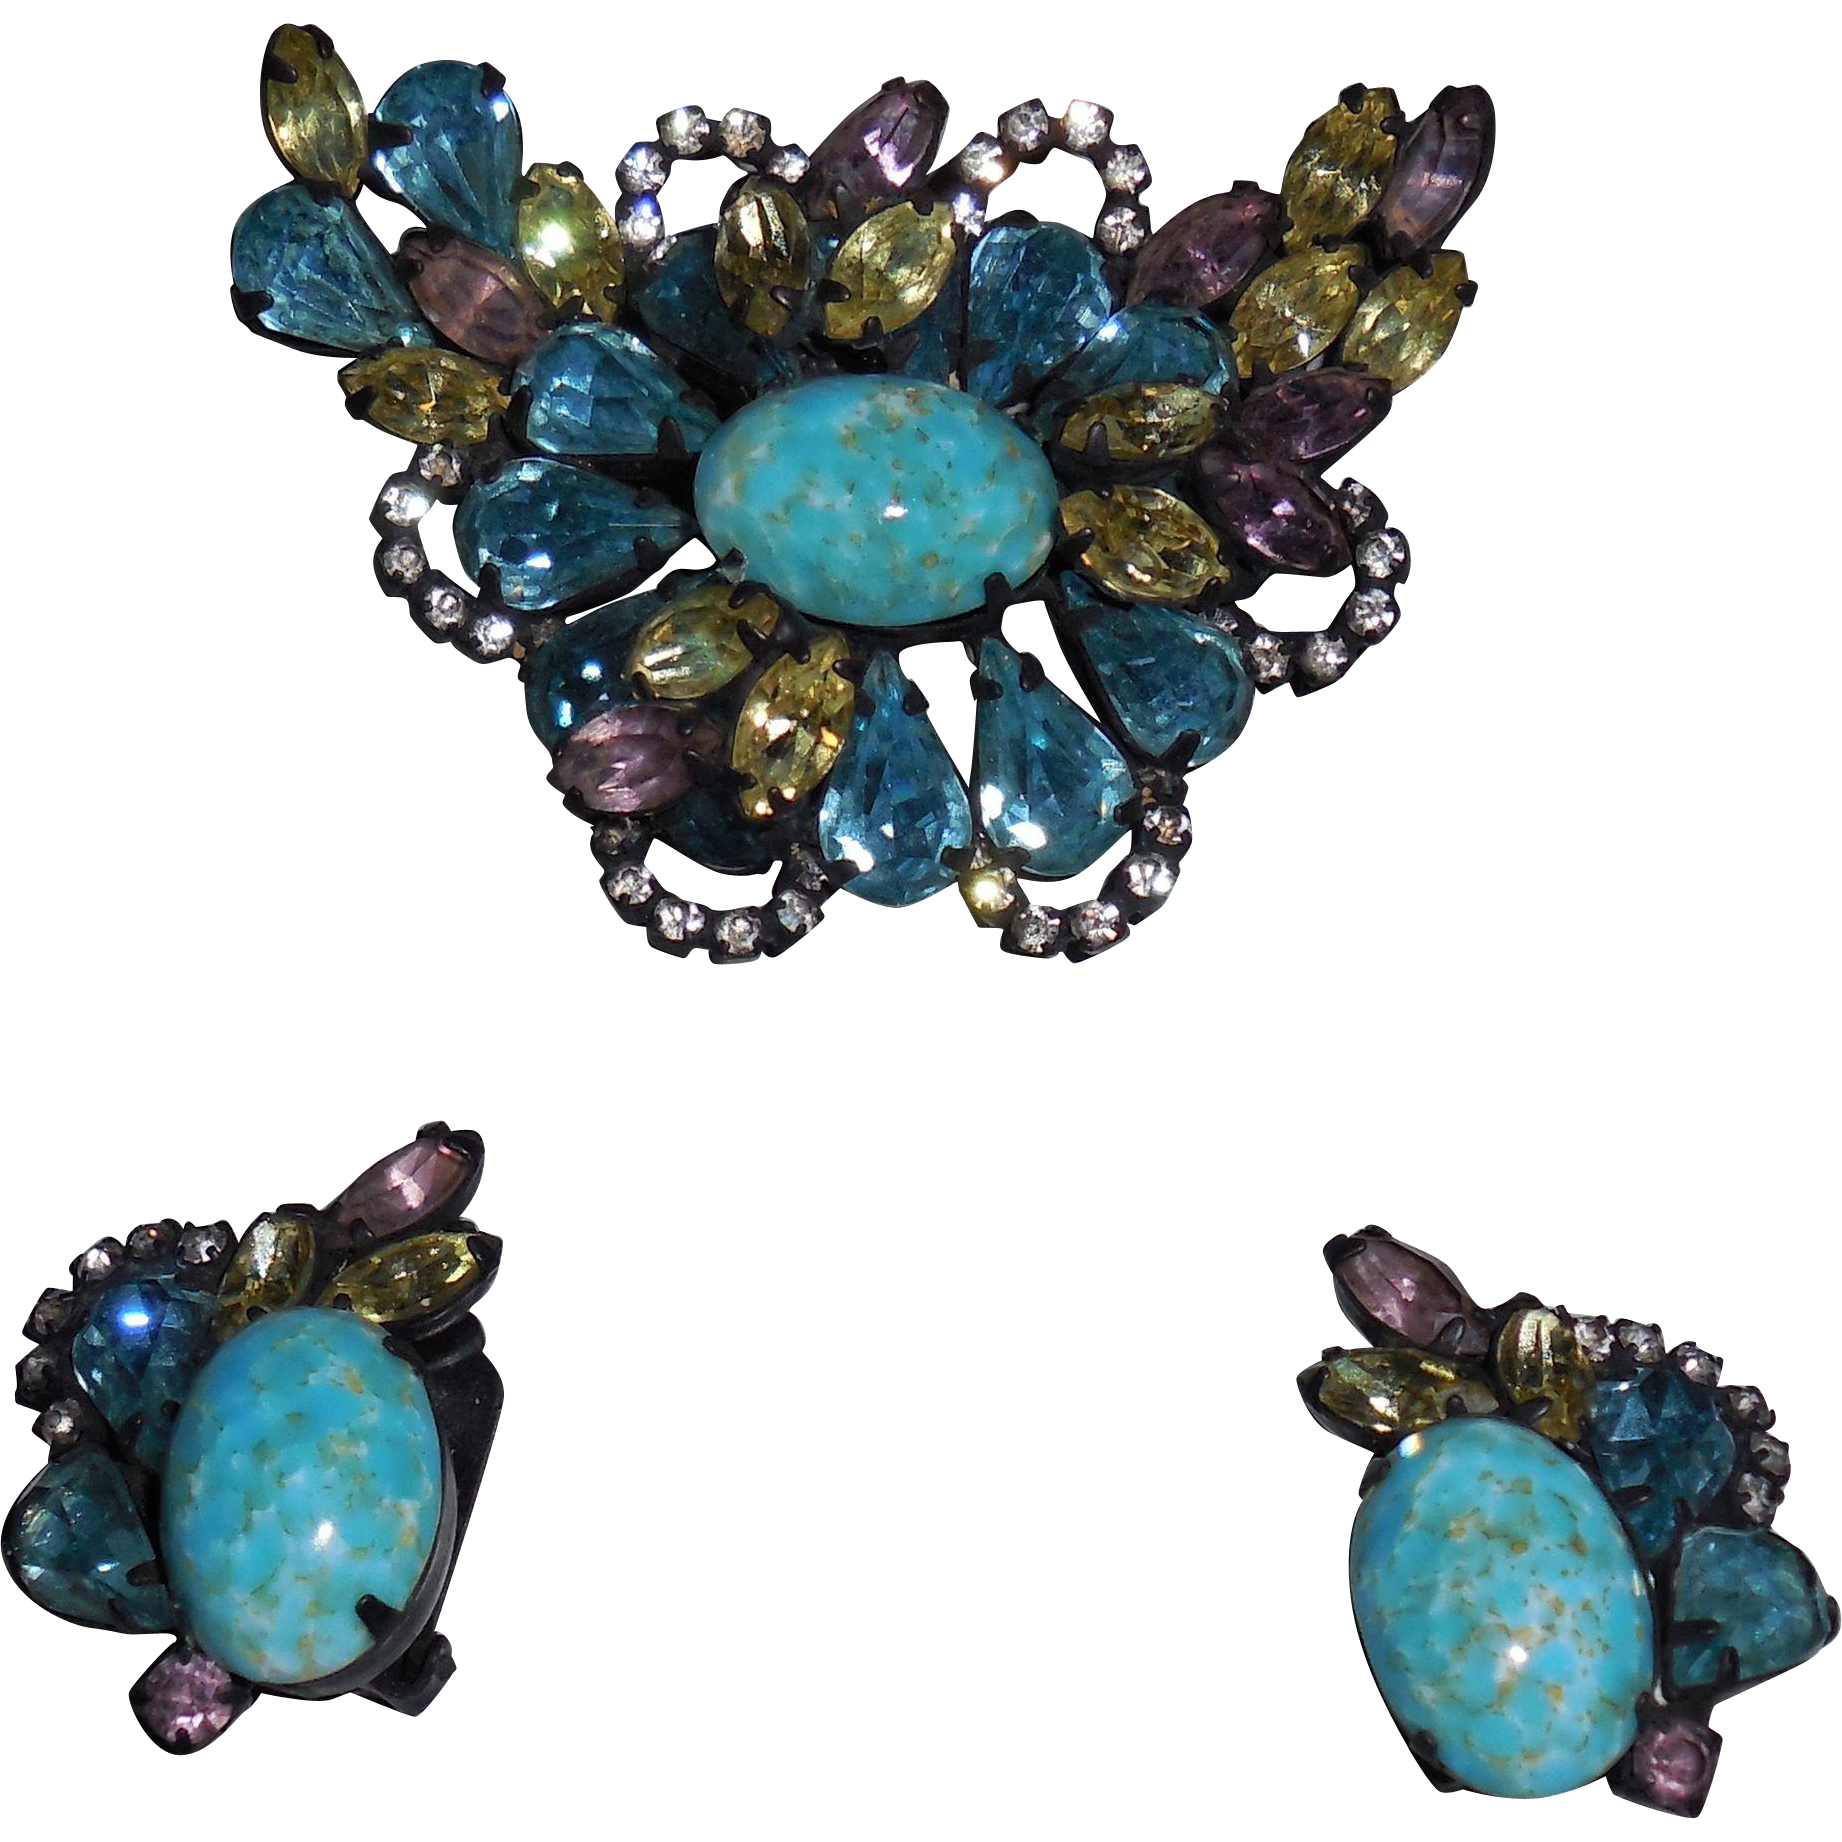 Vintage Hattie Carnegie Japanned Pin Brooch and Clip Earrings